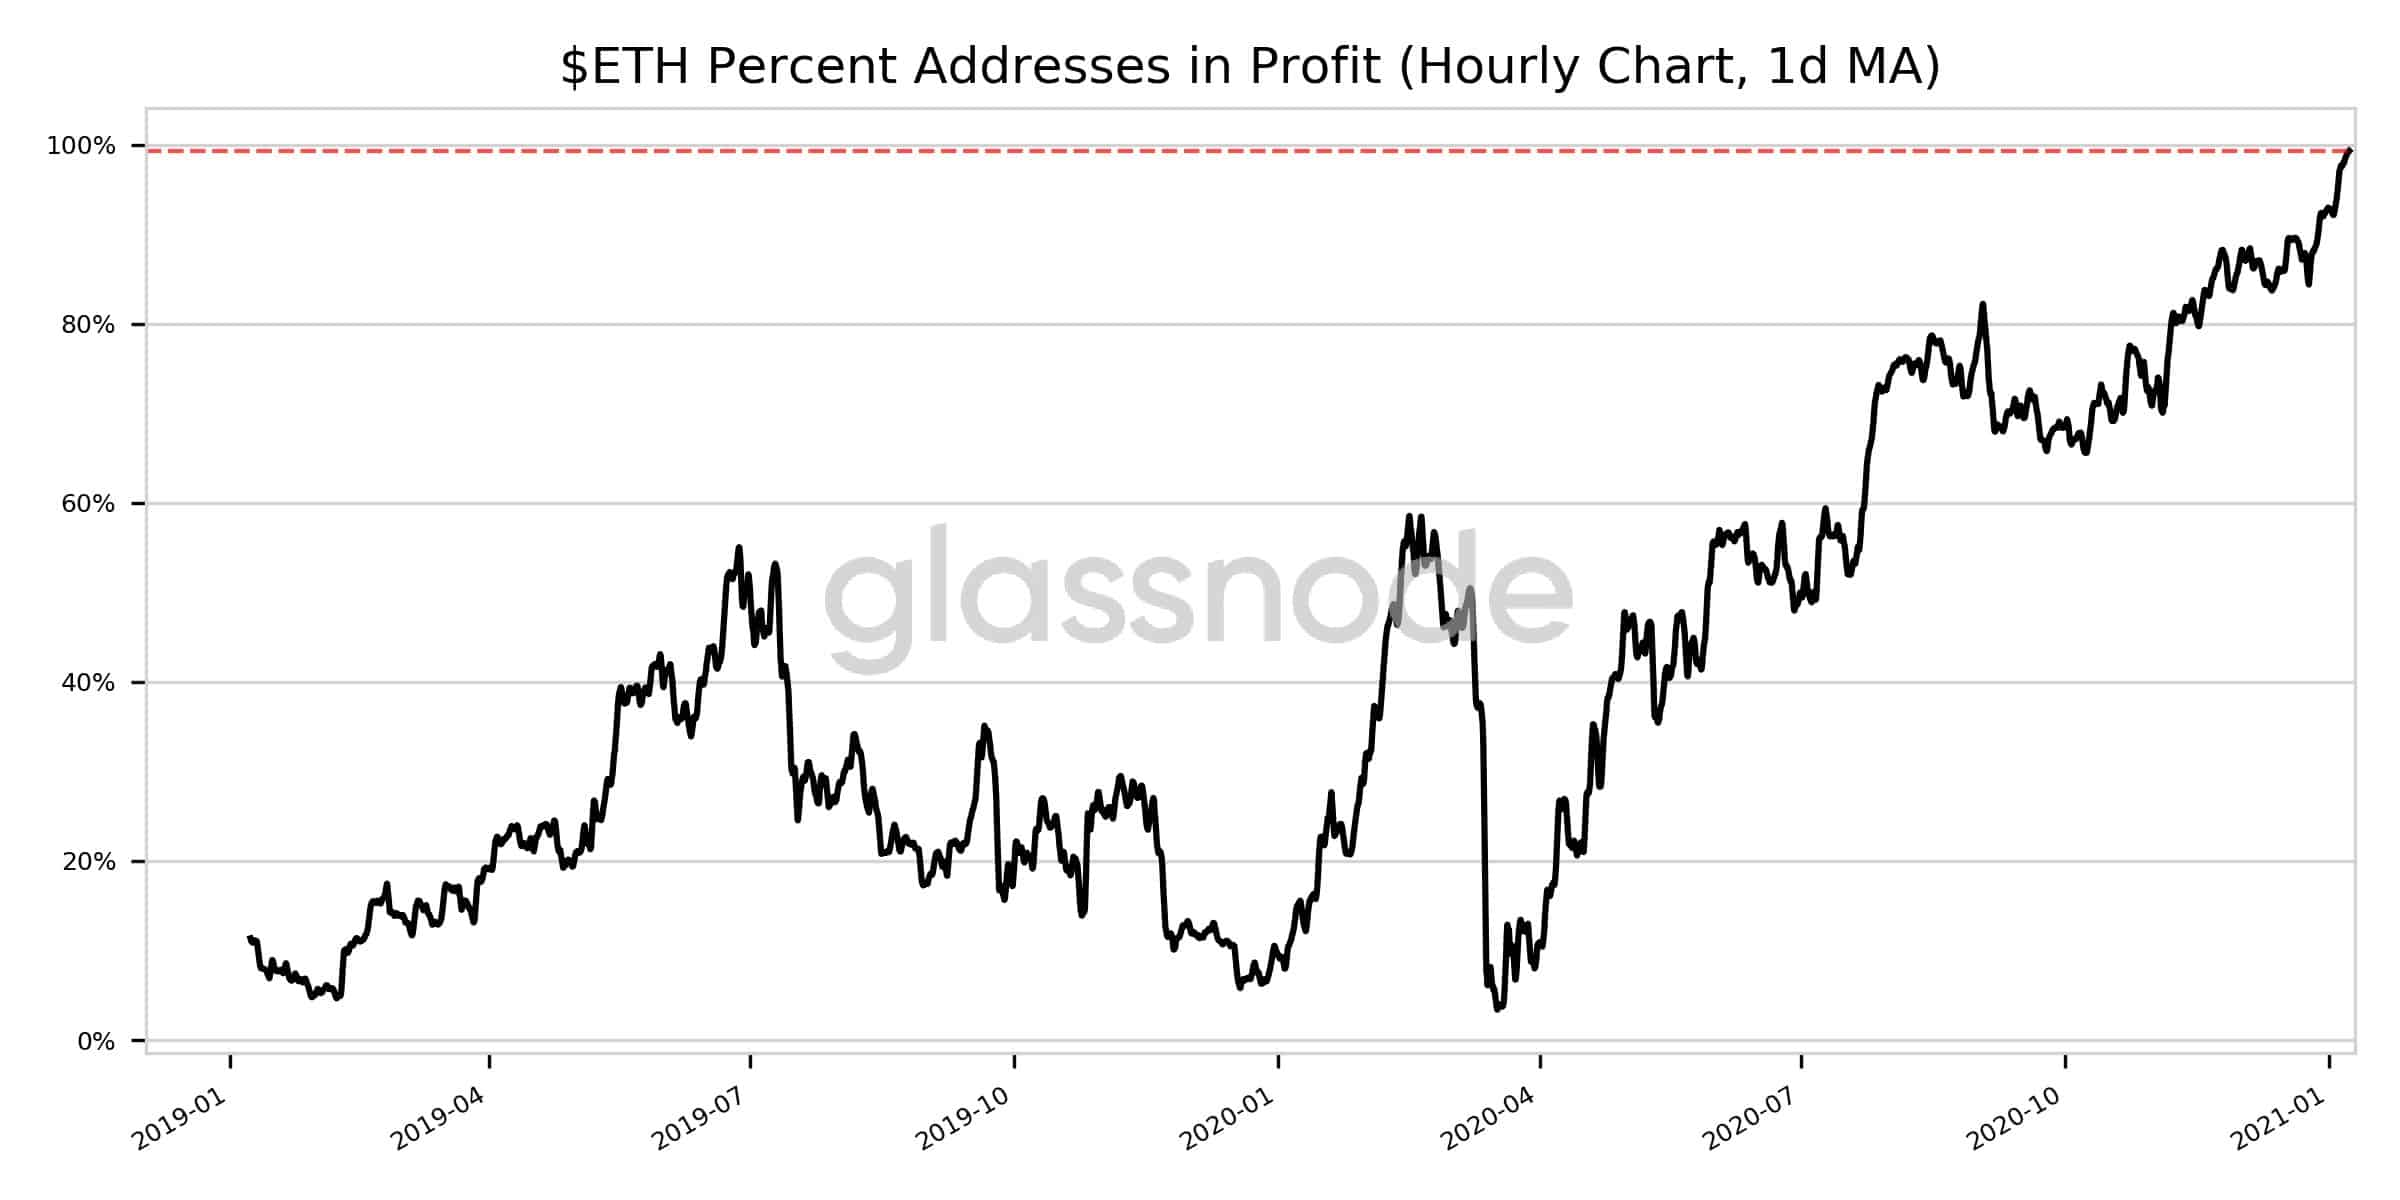 Ethereum Percent Addresses In Profit. Source: Glassnode